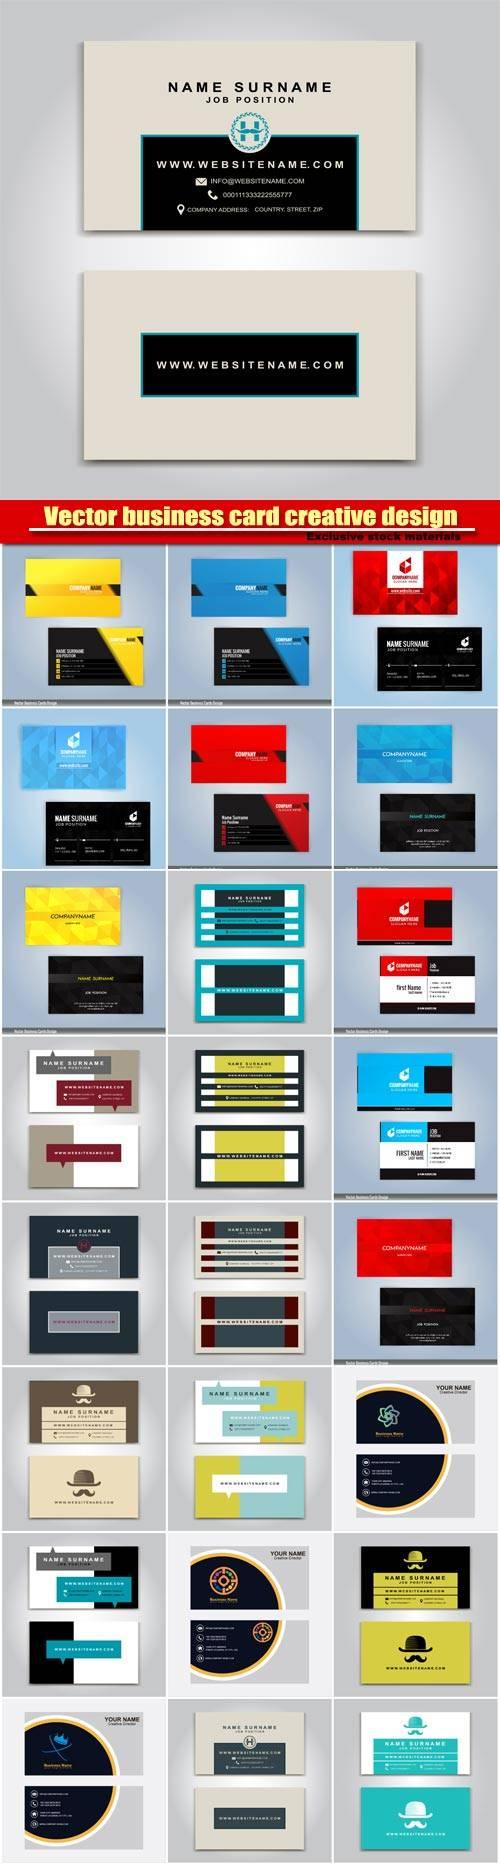 Vector business card creative design